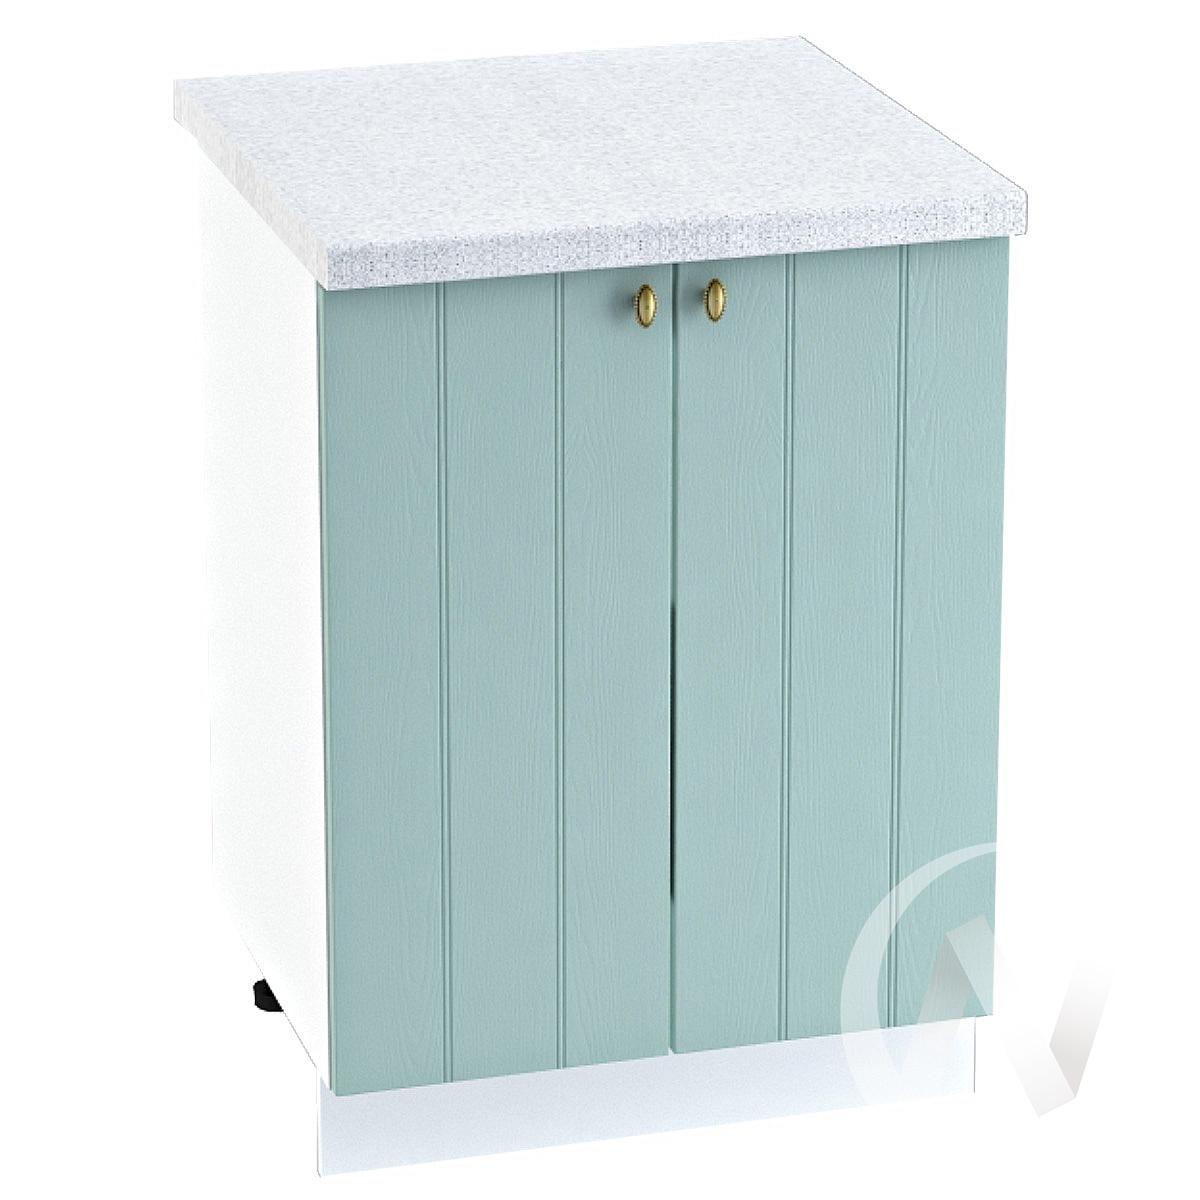 "Кухня ""Прованс"": Шкаф нижний 600, ШН 600 новый (голубой/корпус белый)"